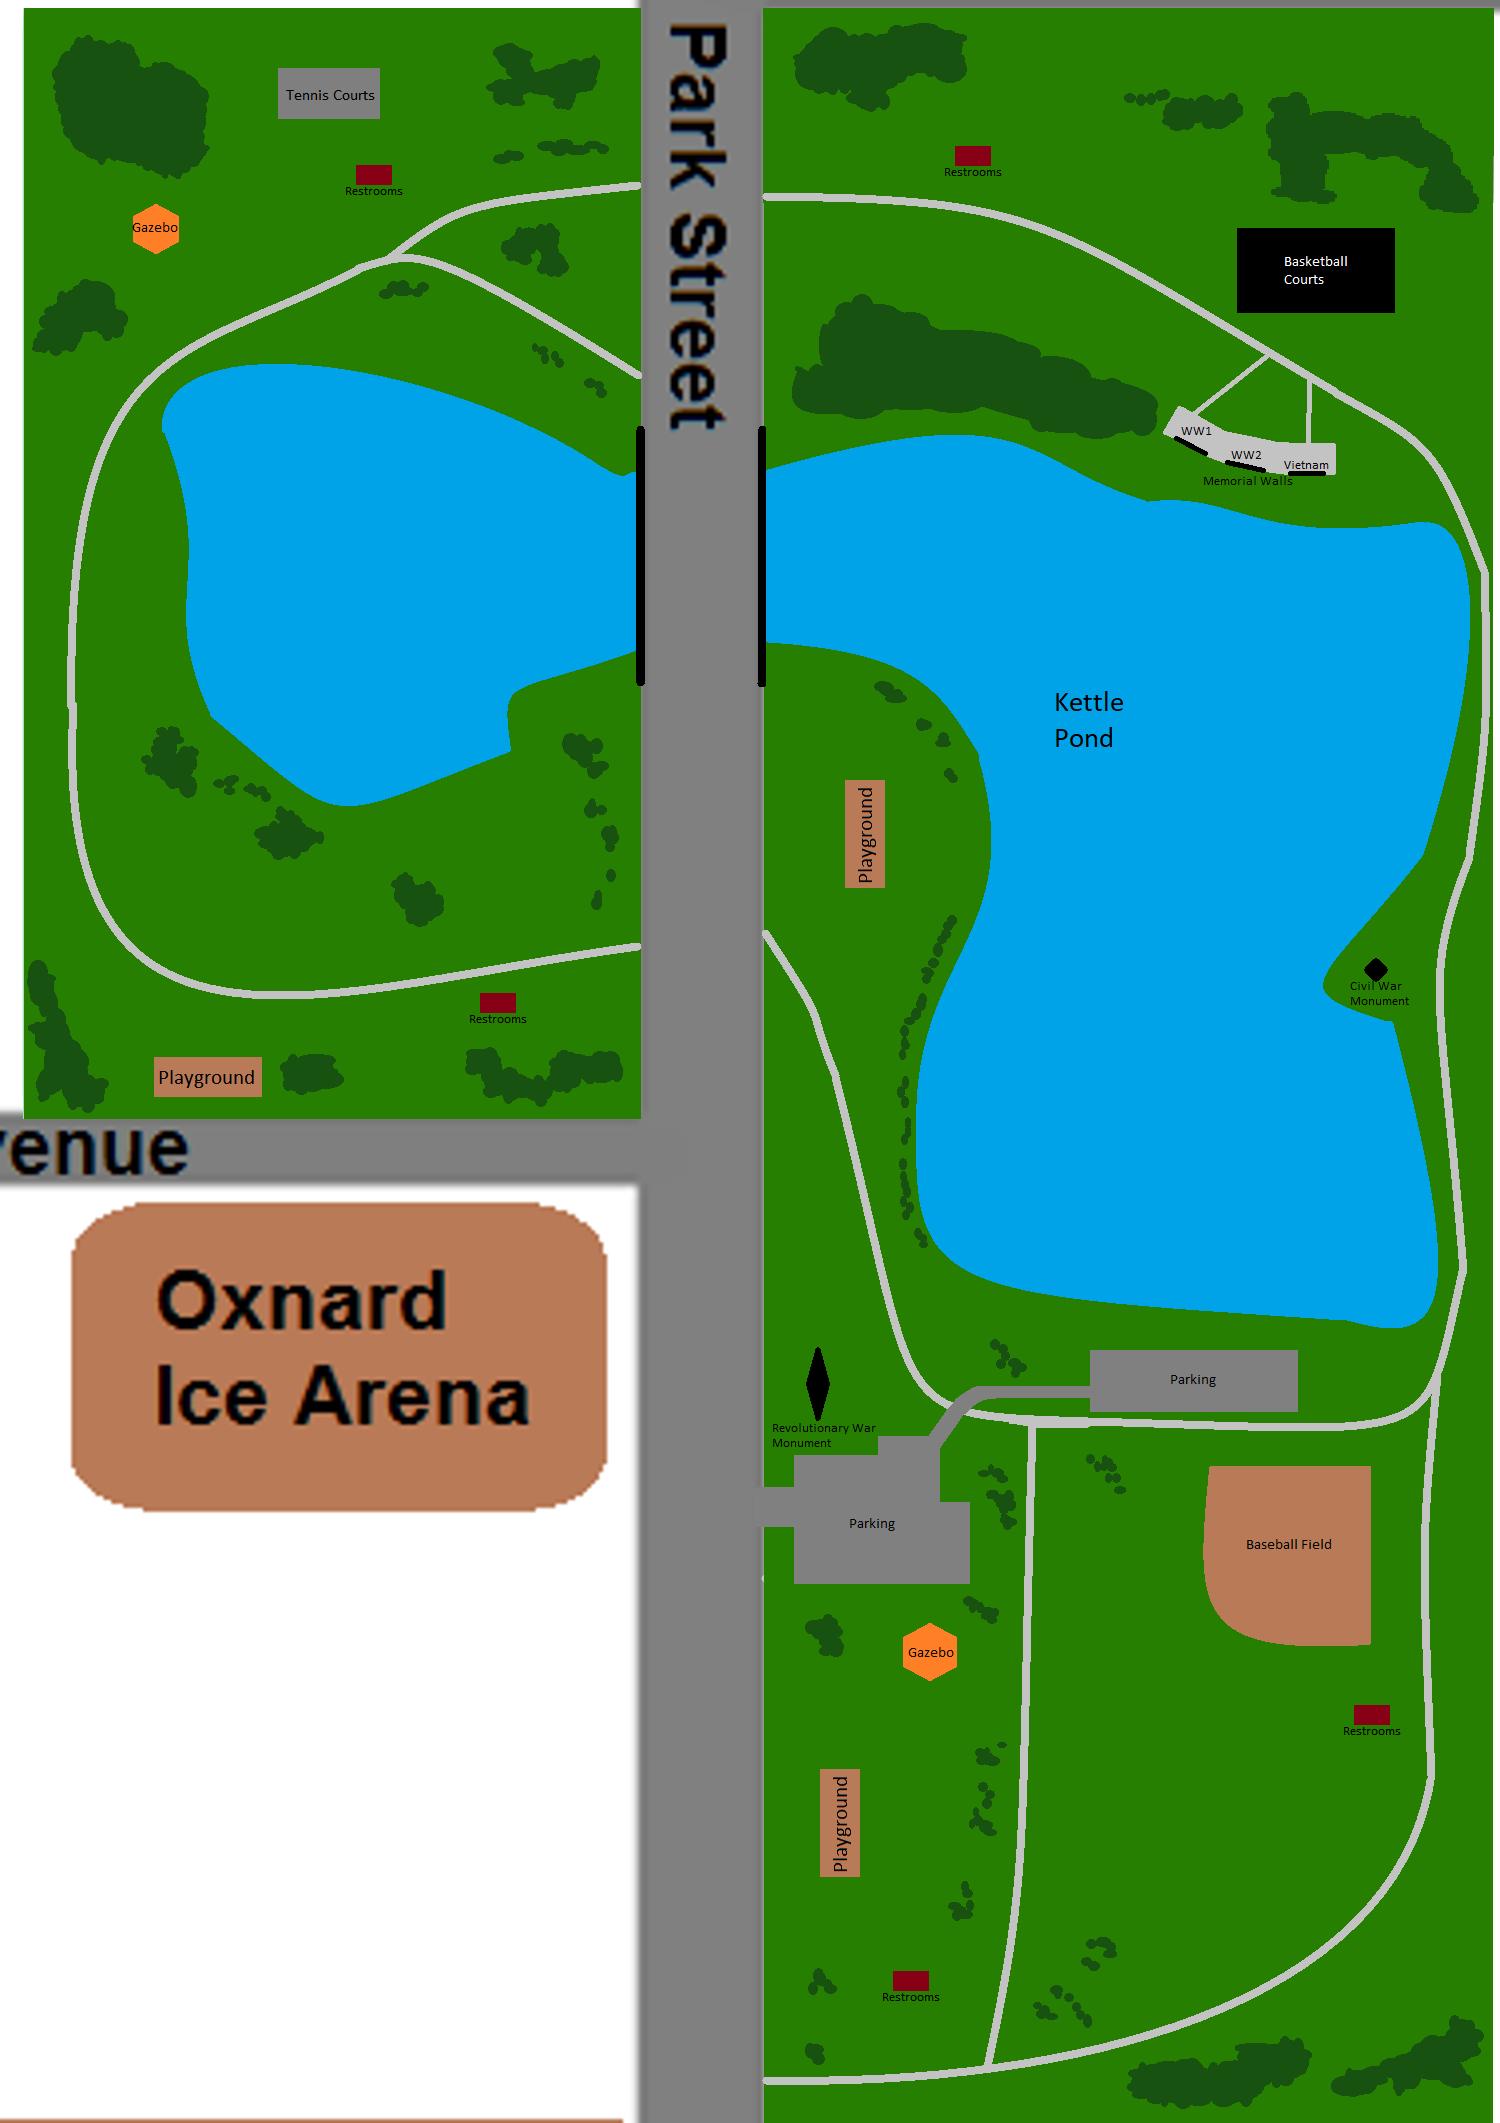 OxnardCenterPark.png